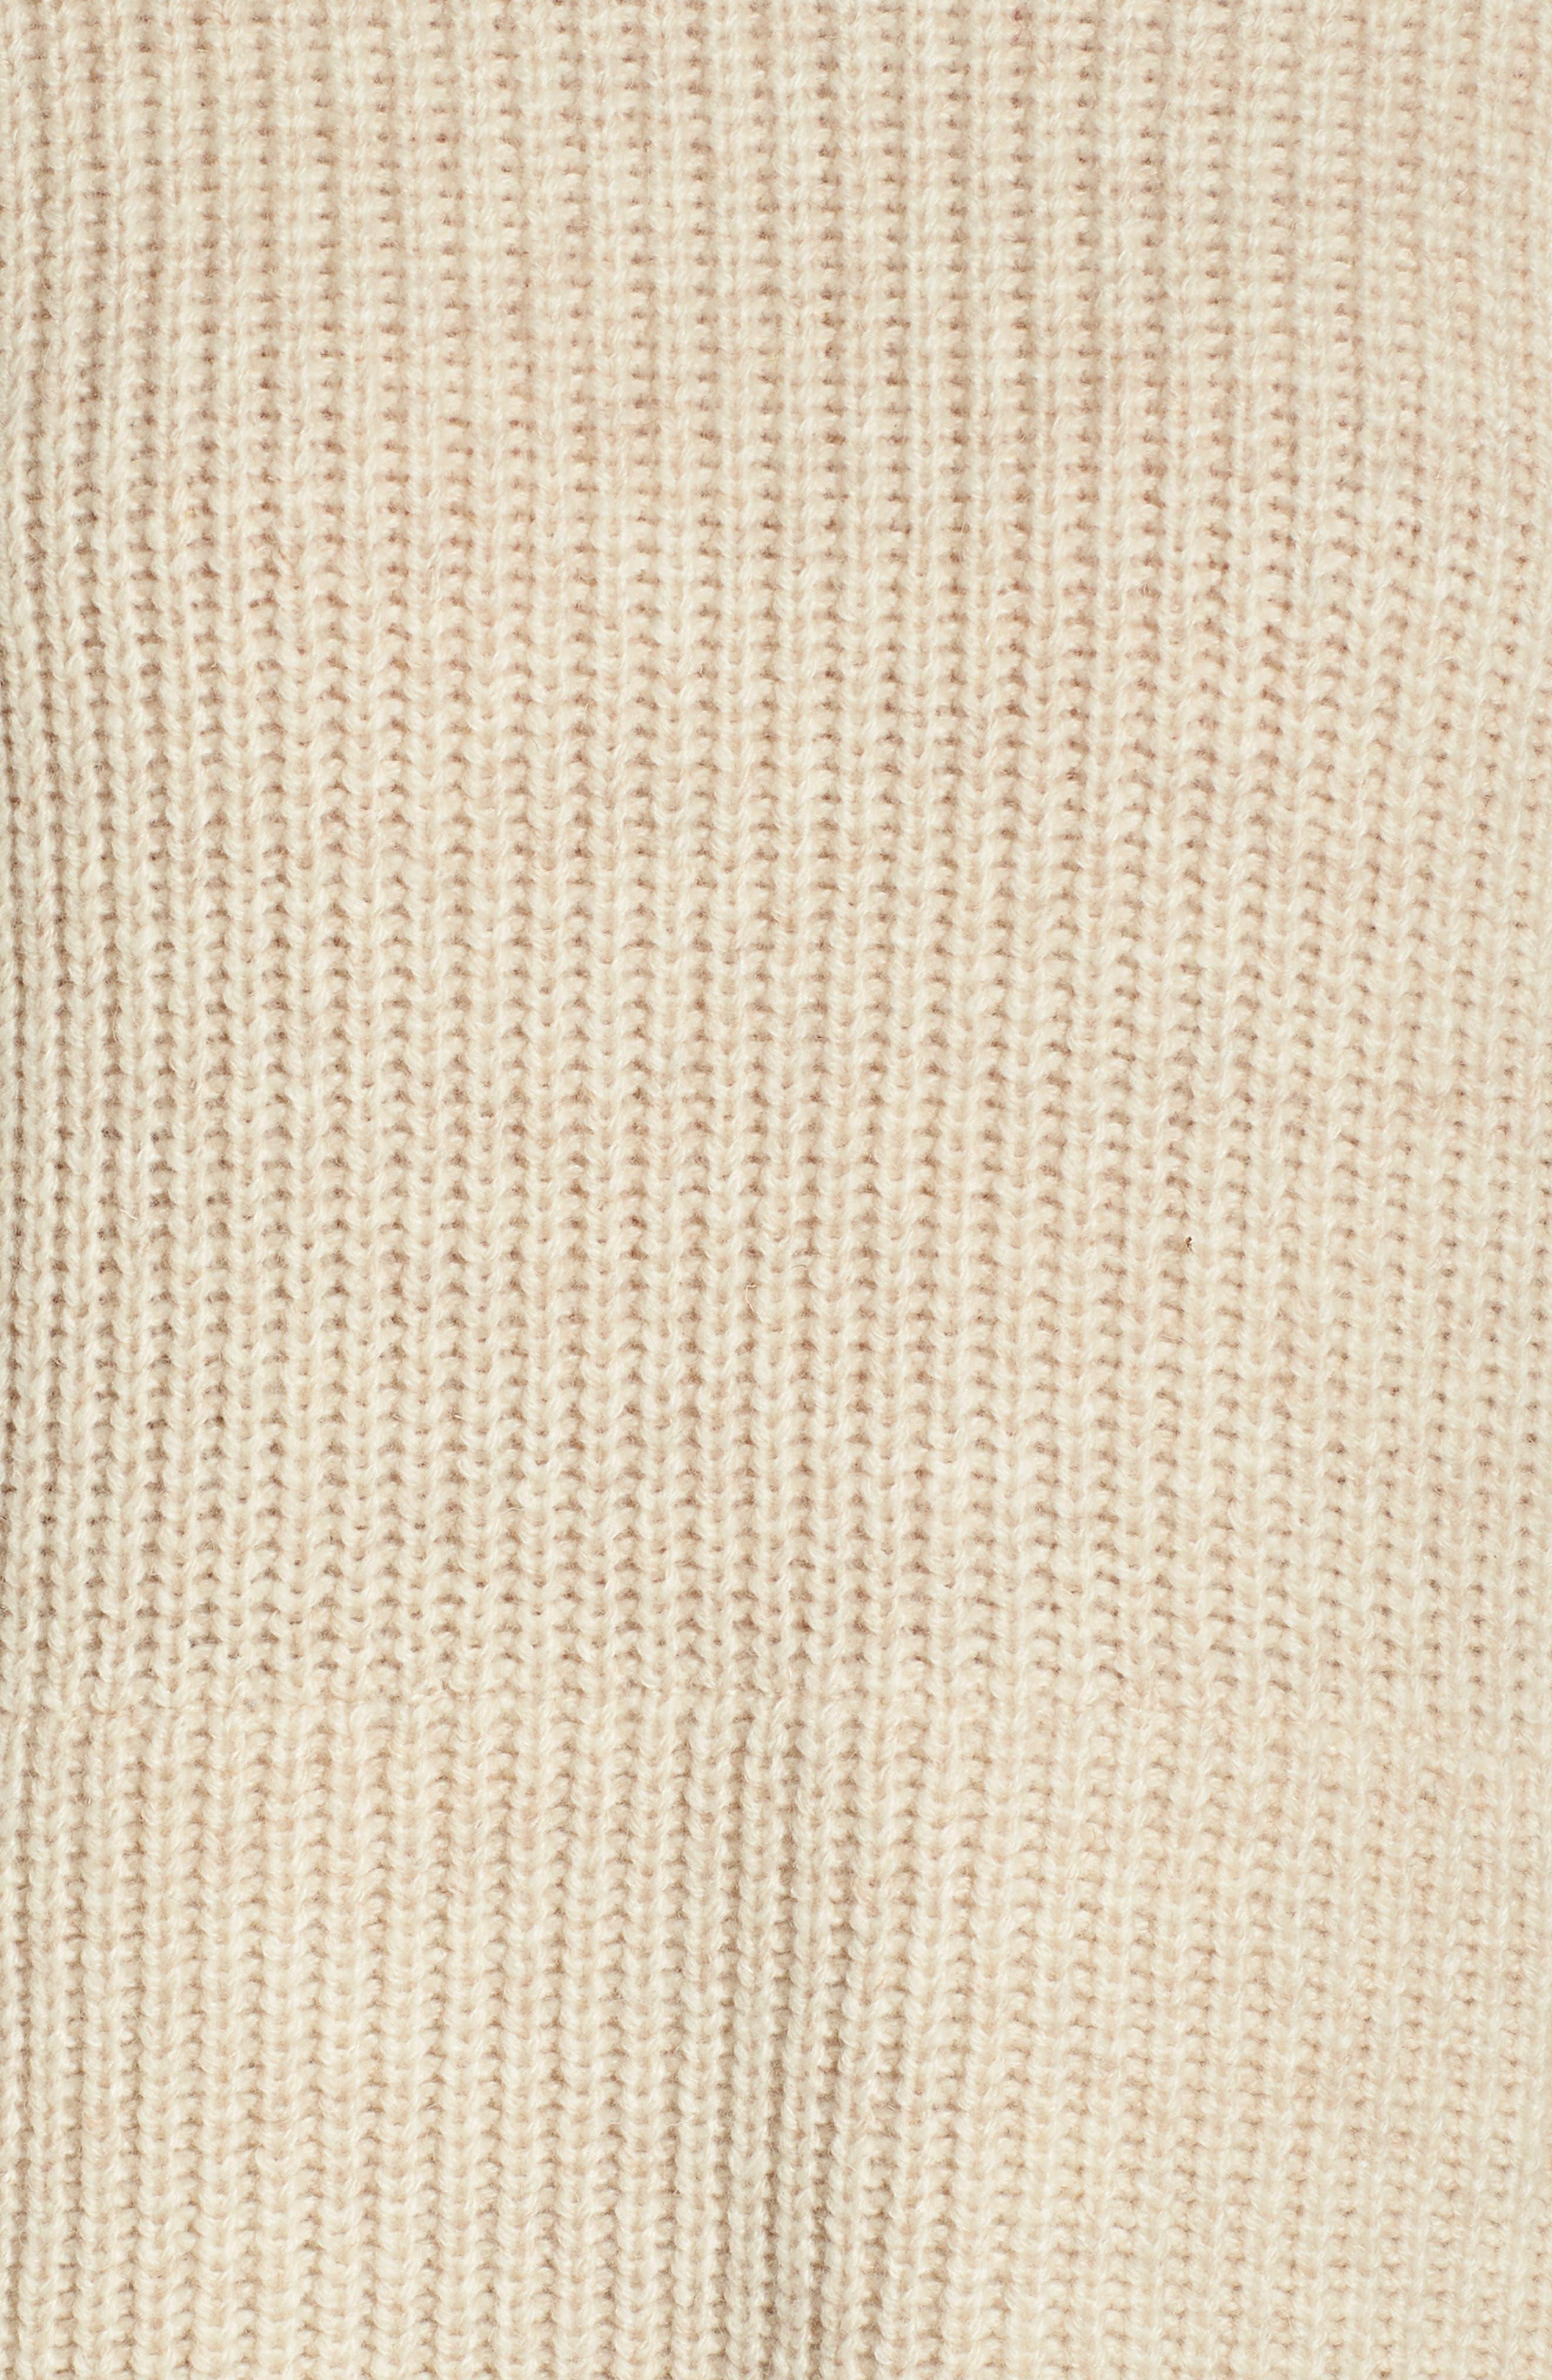 Raelynn Sweater Poncho,                             Alternate thumbnail 5, color,                             CREAM HEATHER